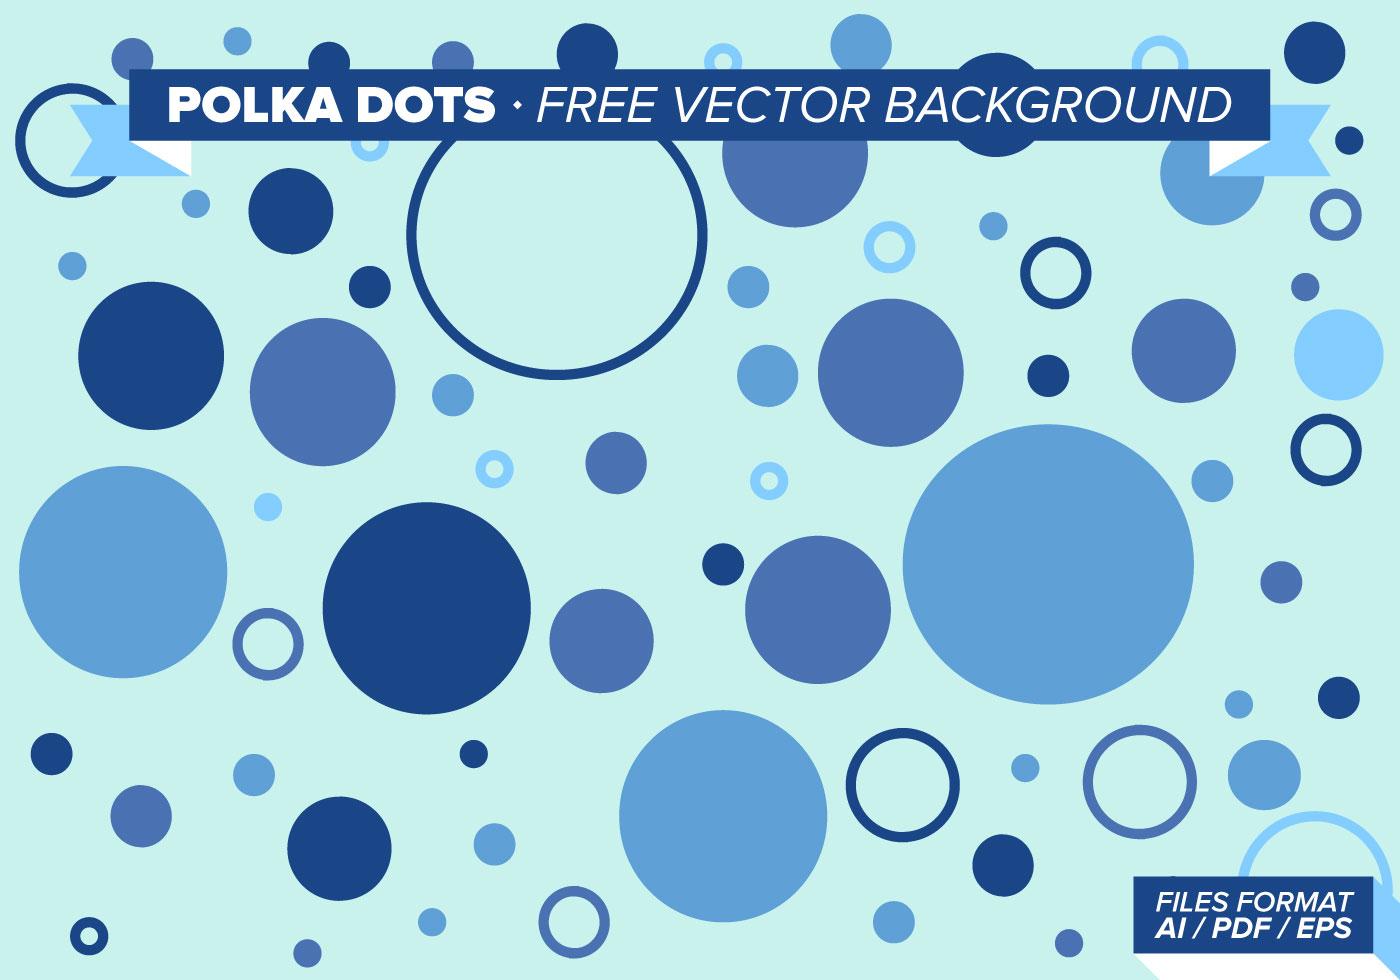 Black And White Polka Dot Wallpaper Border Polka Dots Free Vector Background Download Free Vector